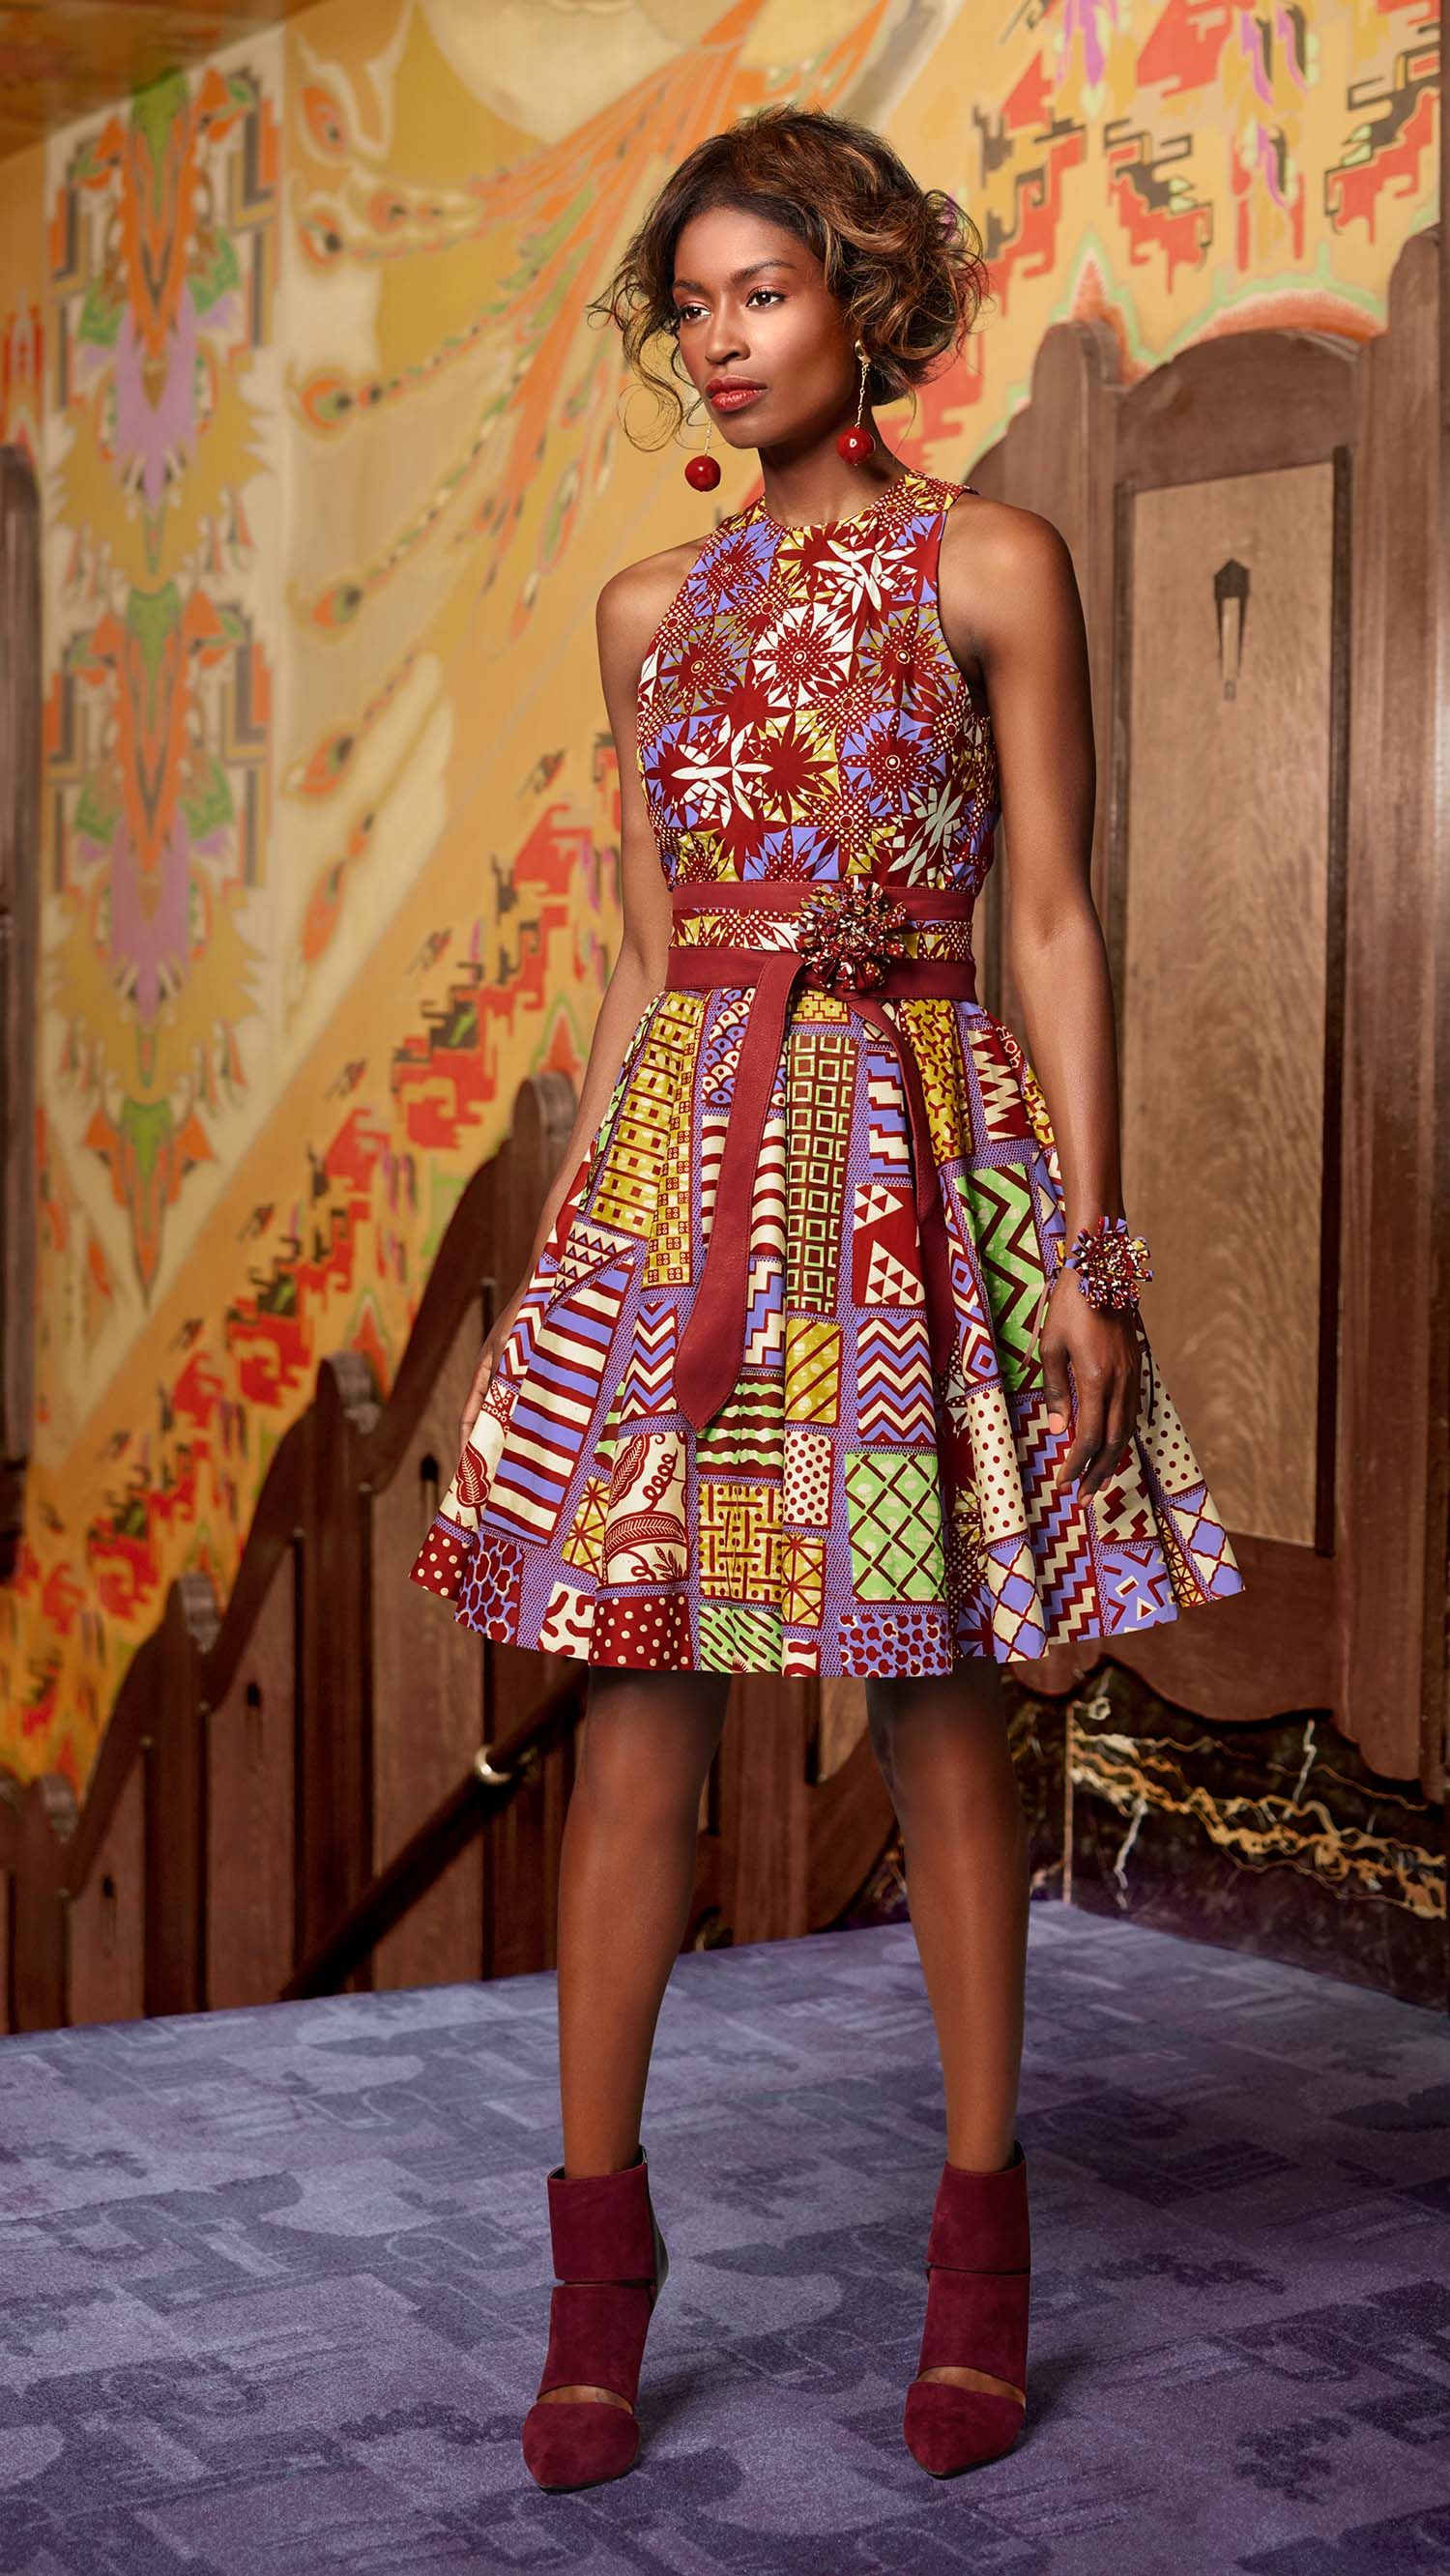 un esprit classique vlisco v inspired mode africaine pinterest mode africaine pagne et. Black Bedroom Furniture Sets. Home Design Ideas